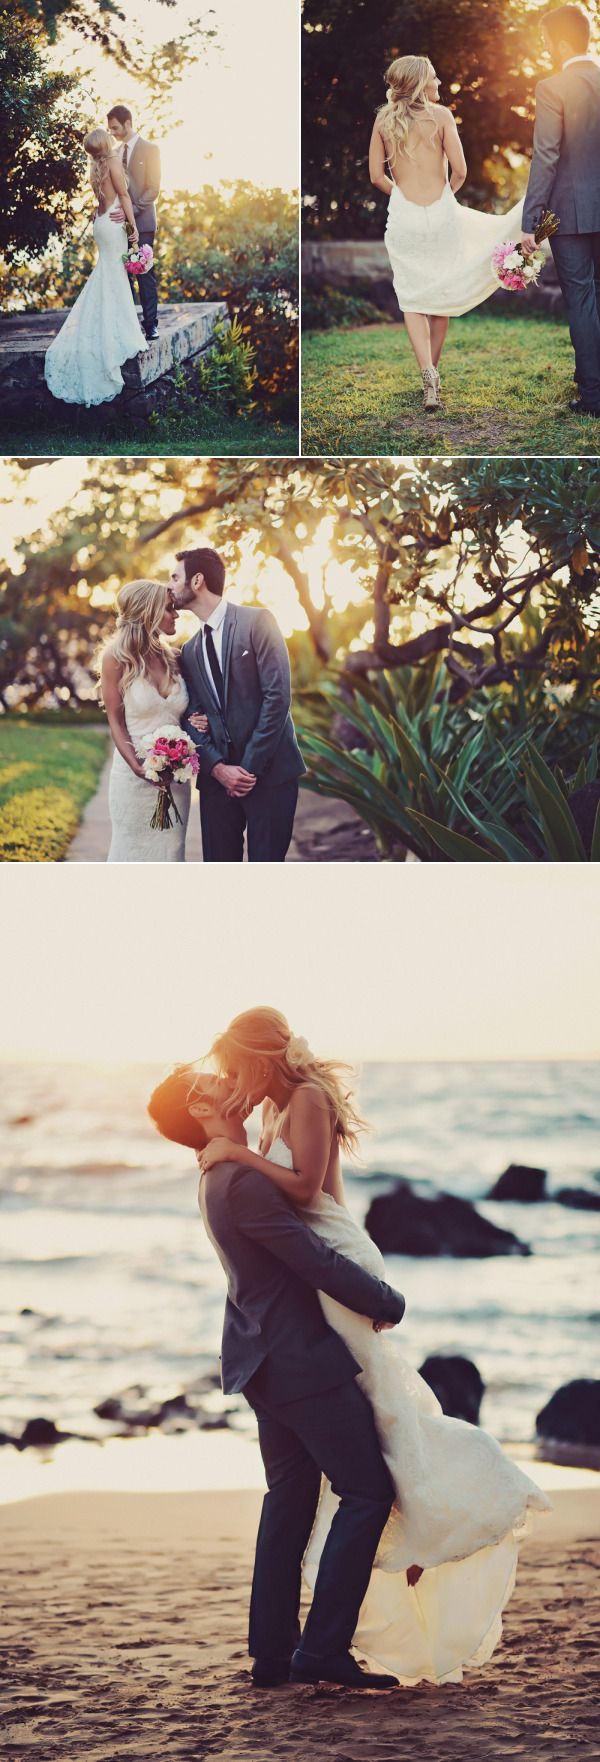 Best 25 Hawaii wedding ideas on Pinterest Hawaiian destination